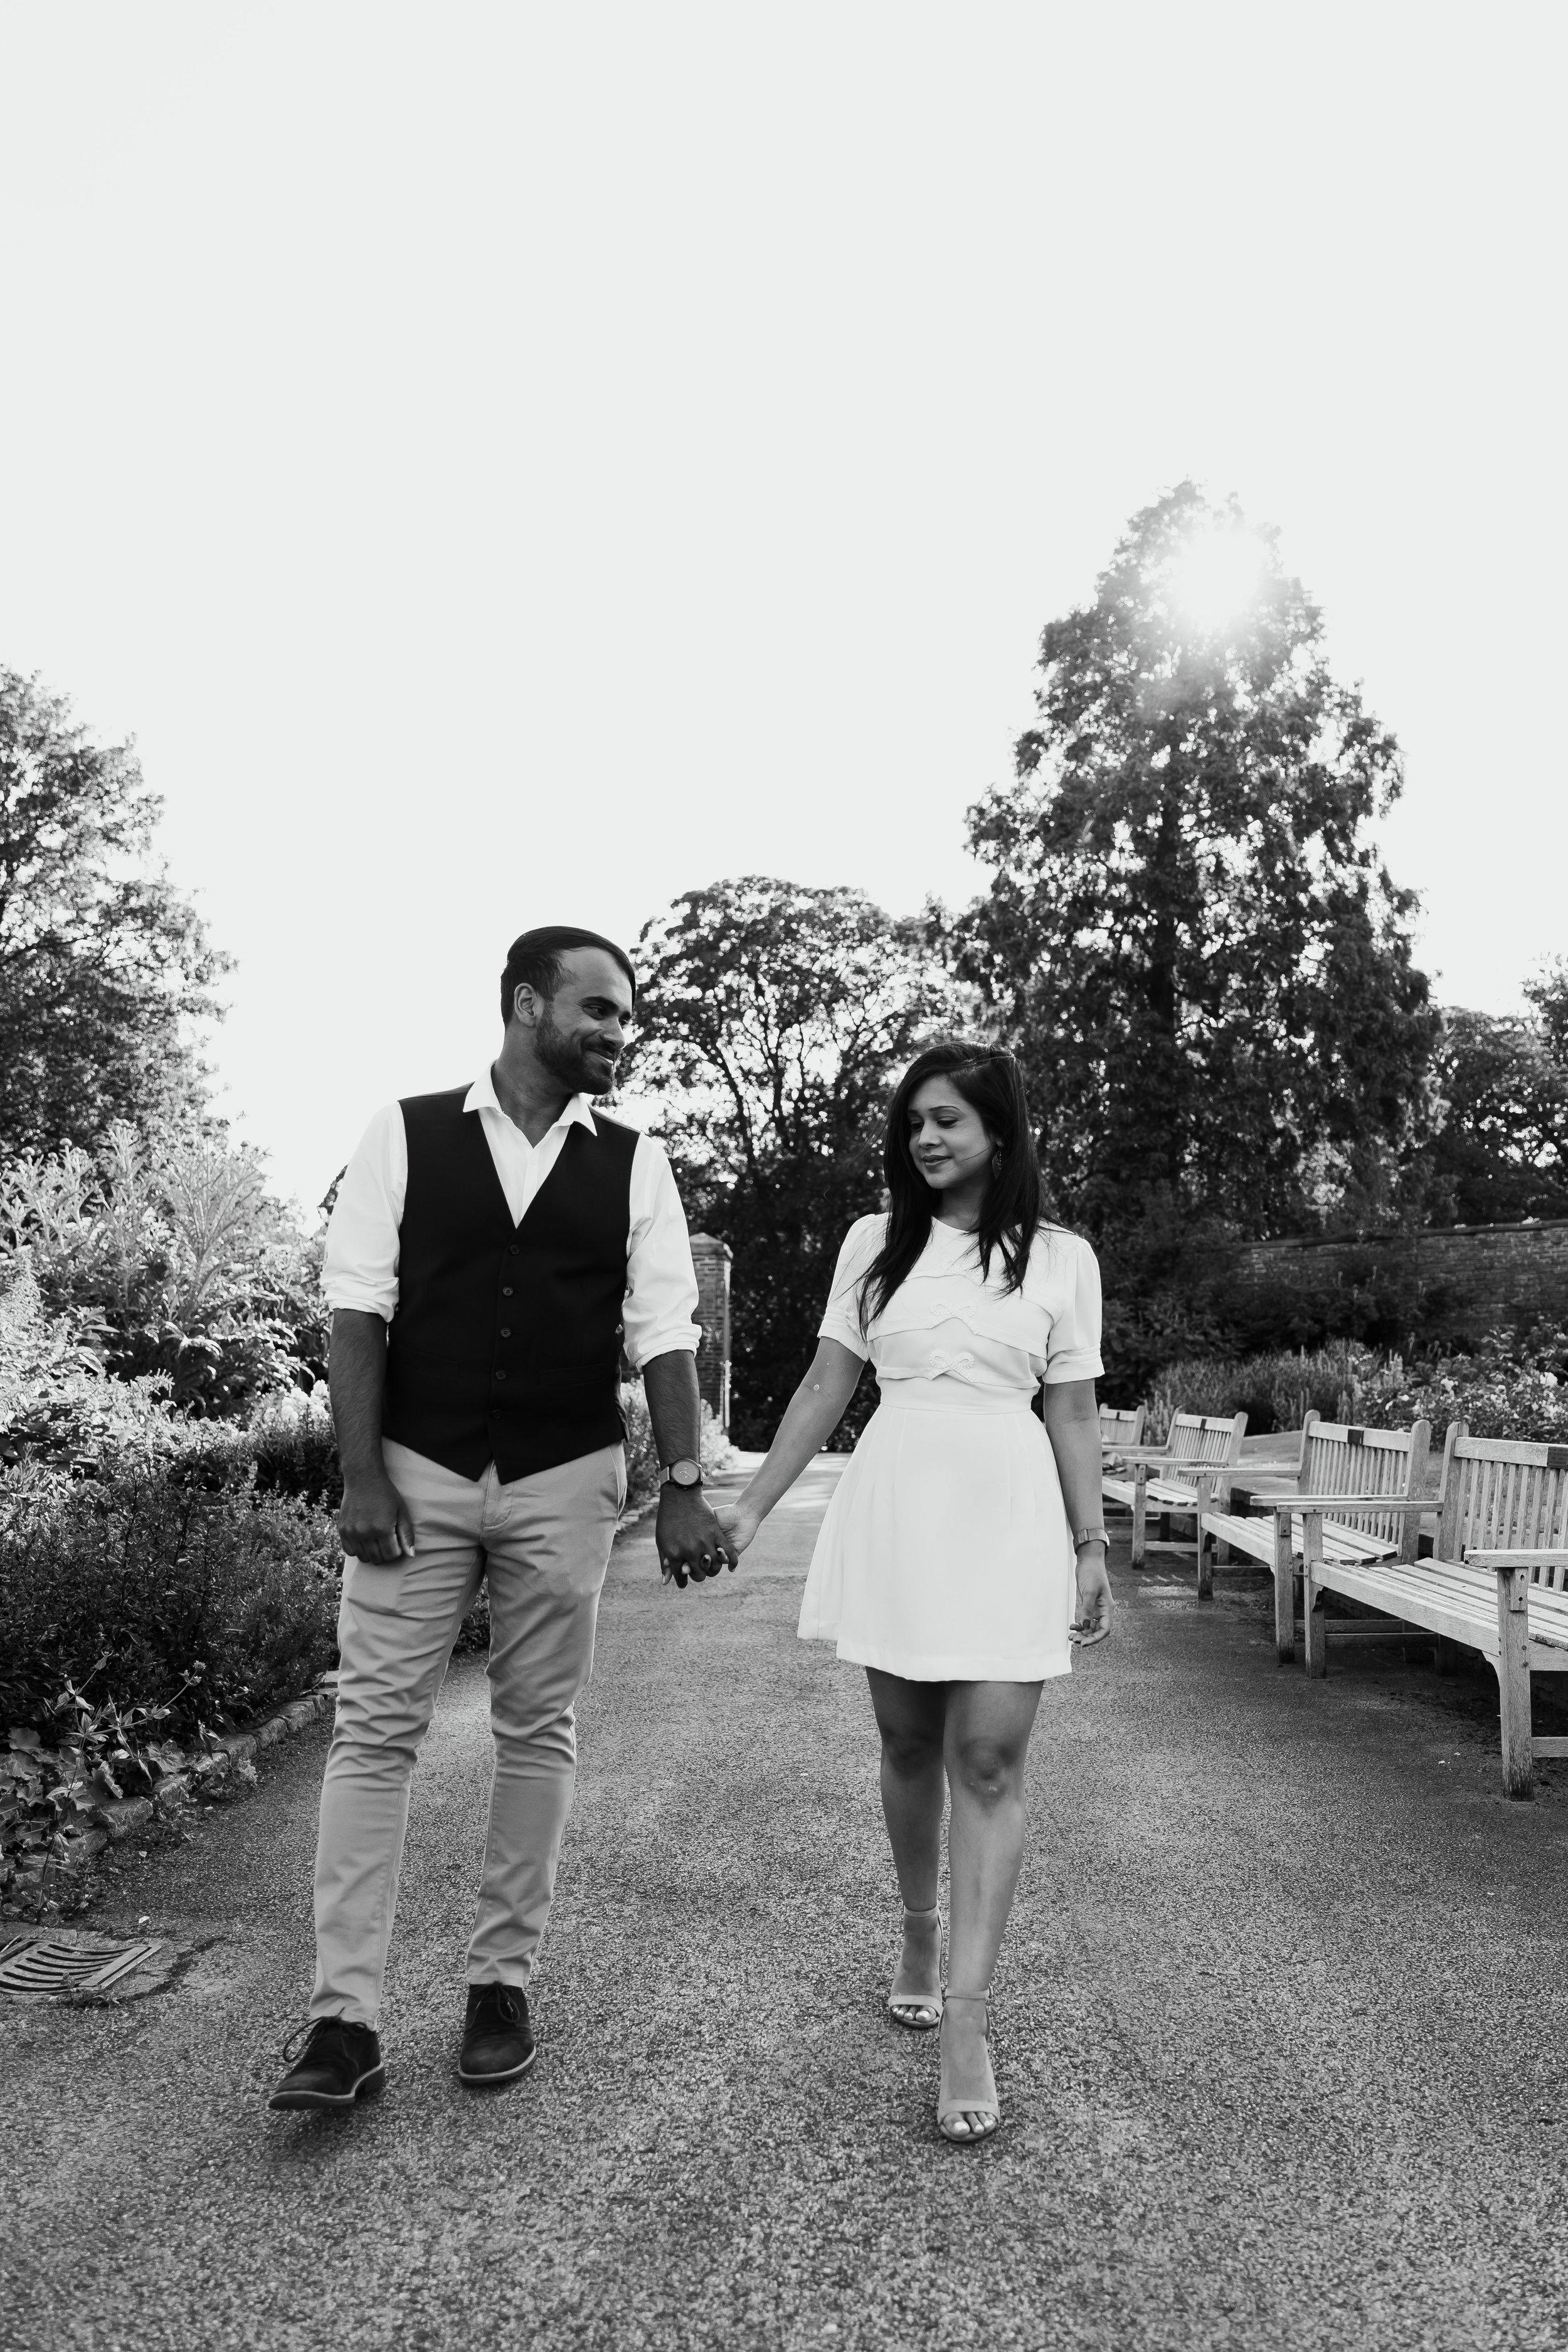 VICTORIABAKERWEDDINGSNirosha&AsangaPreweddingTempleNewsam-36.jpg